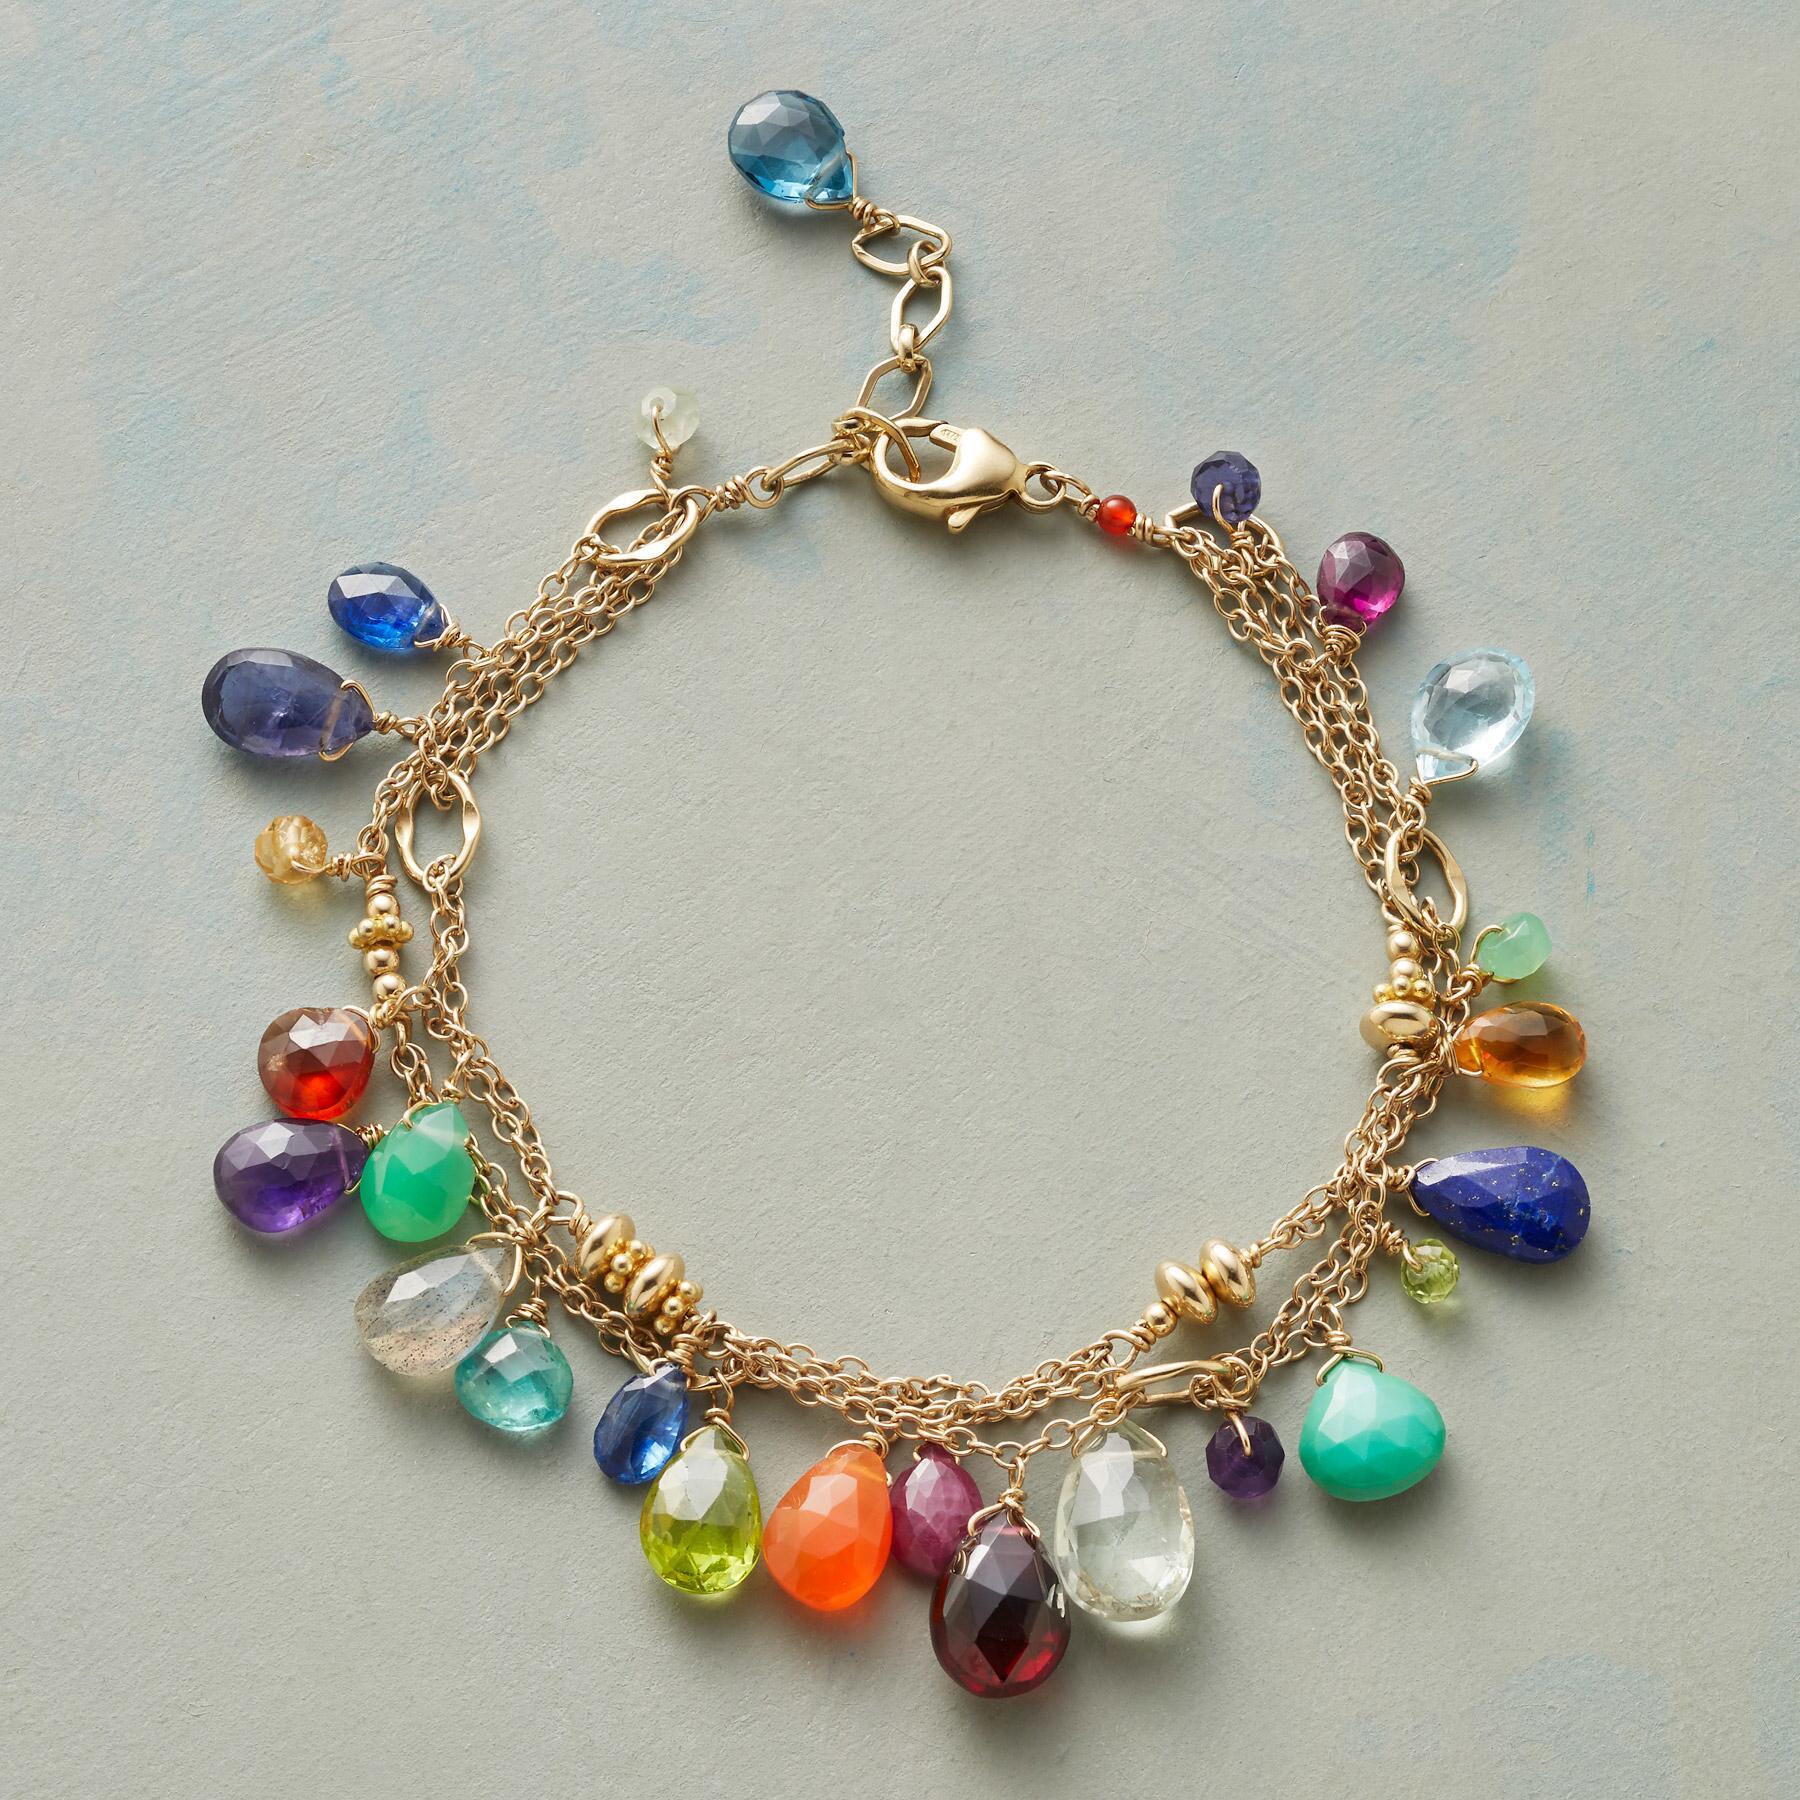 Lisa Yang's Jewelry Blog: 6 Tips for Making Elastic ...